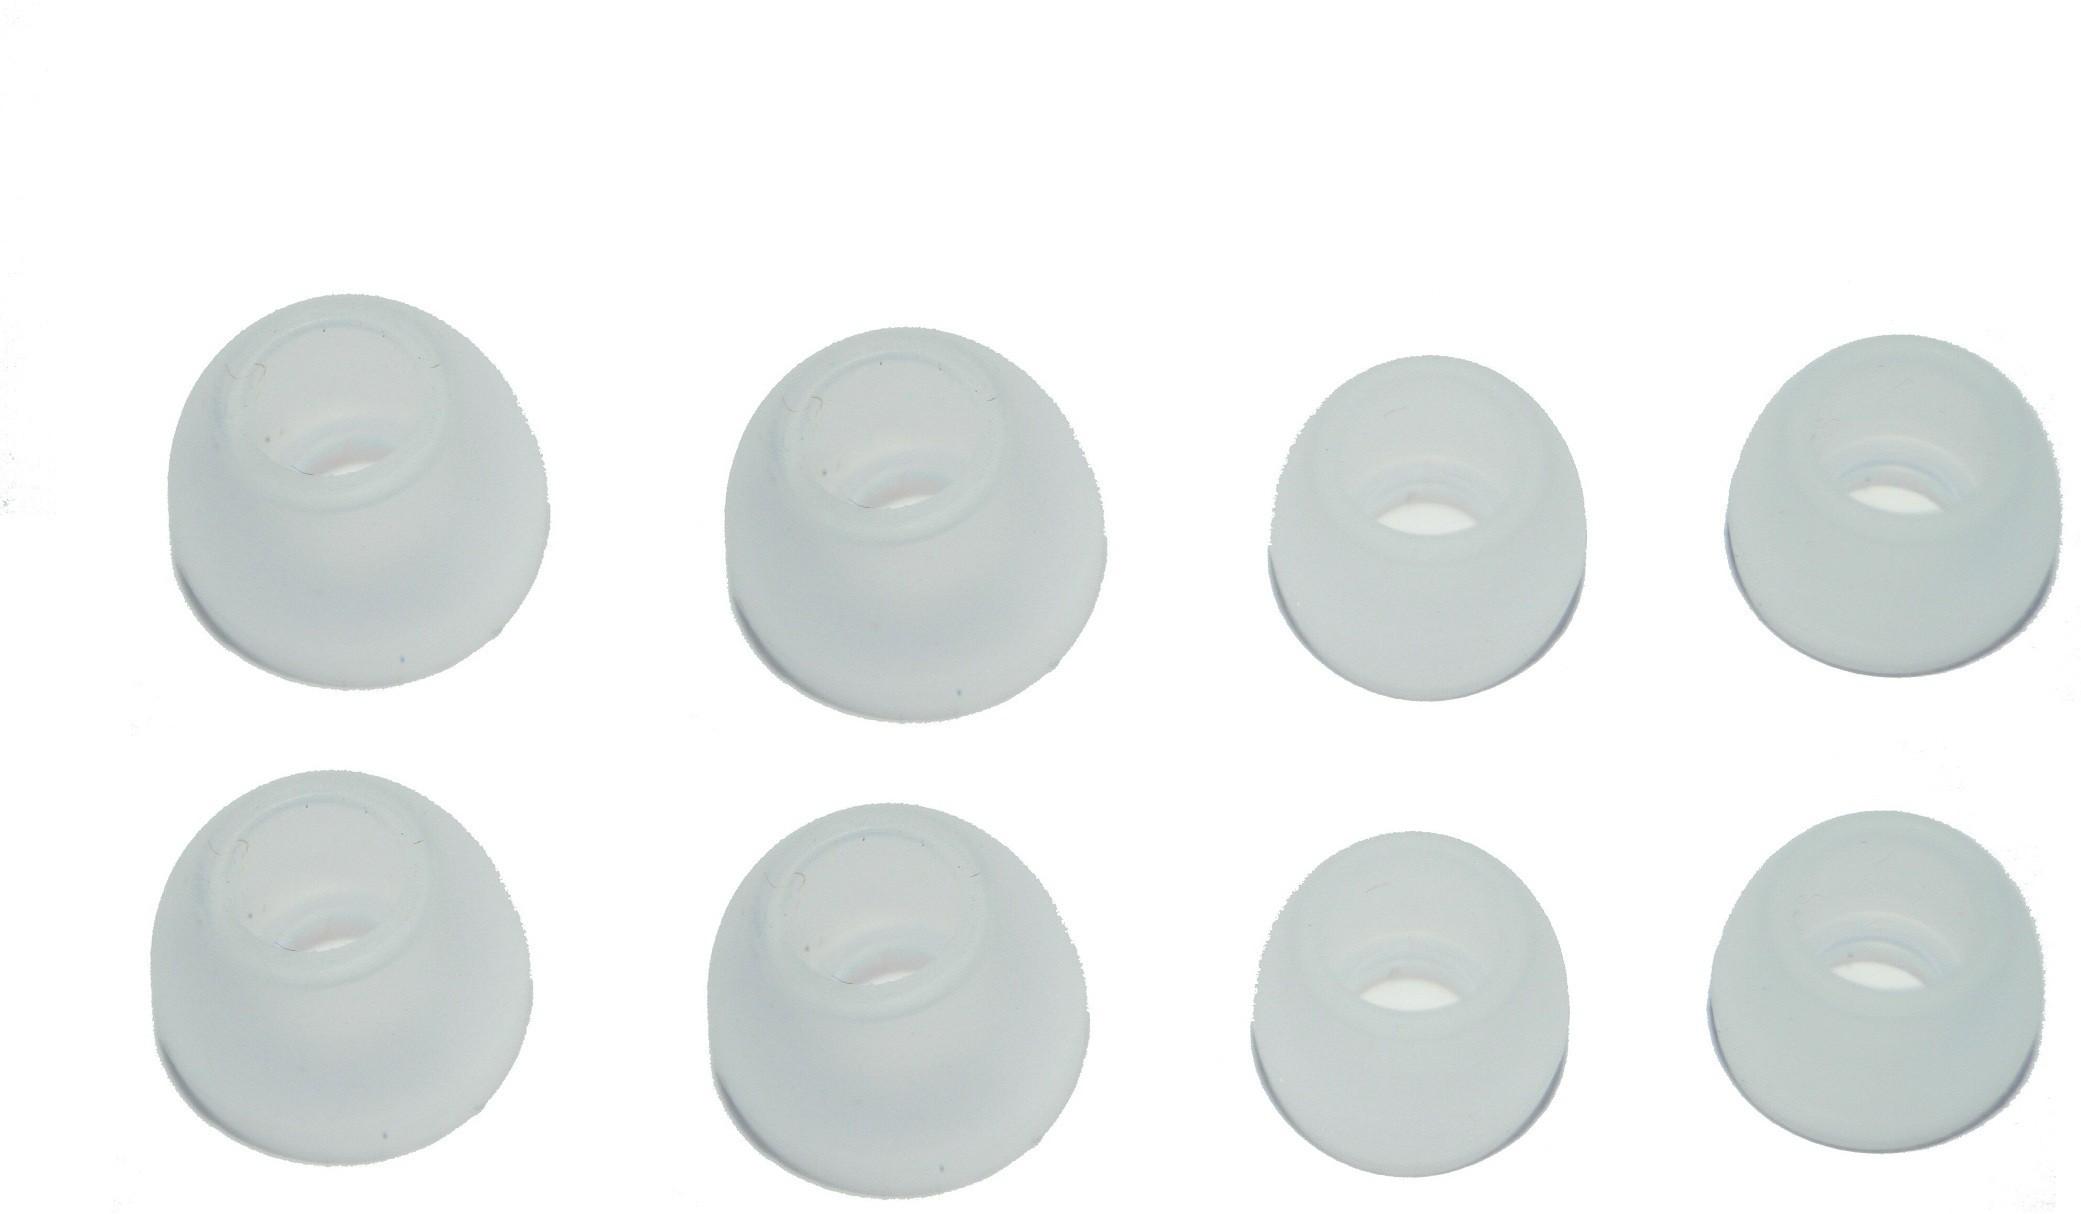 atabz White Silicon earphone buds tips 4pair In The Ear Headphone Cushion